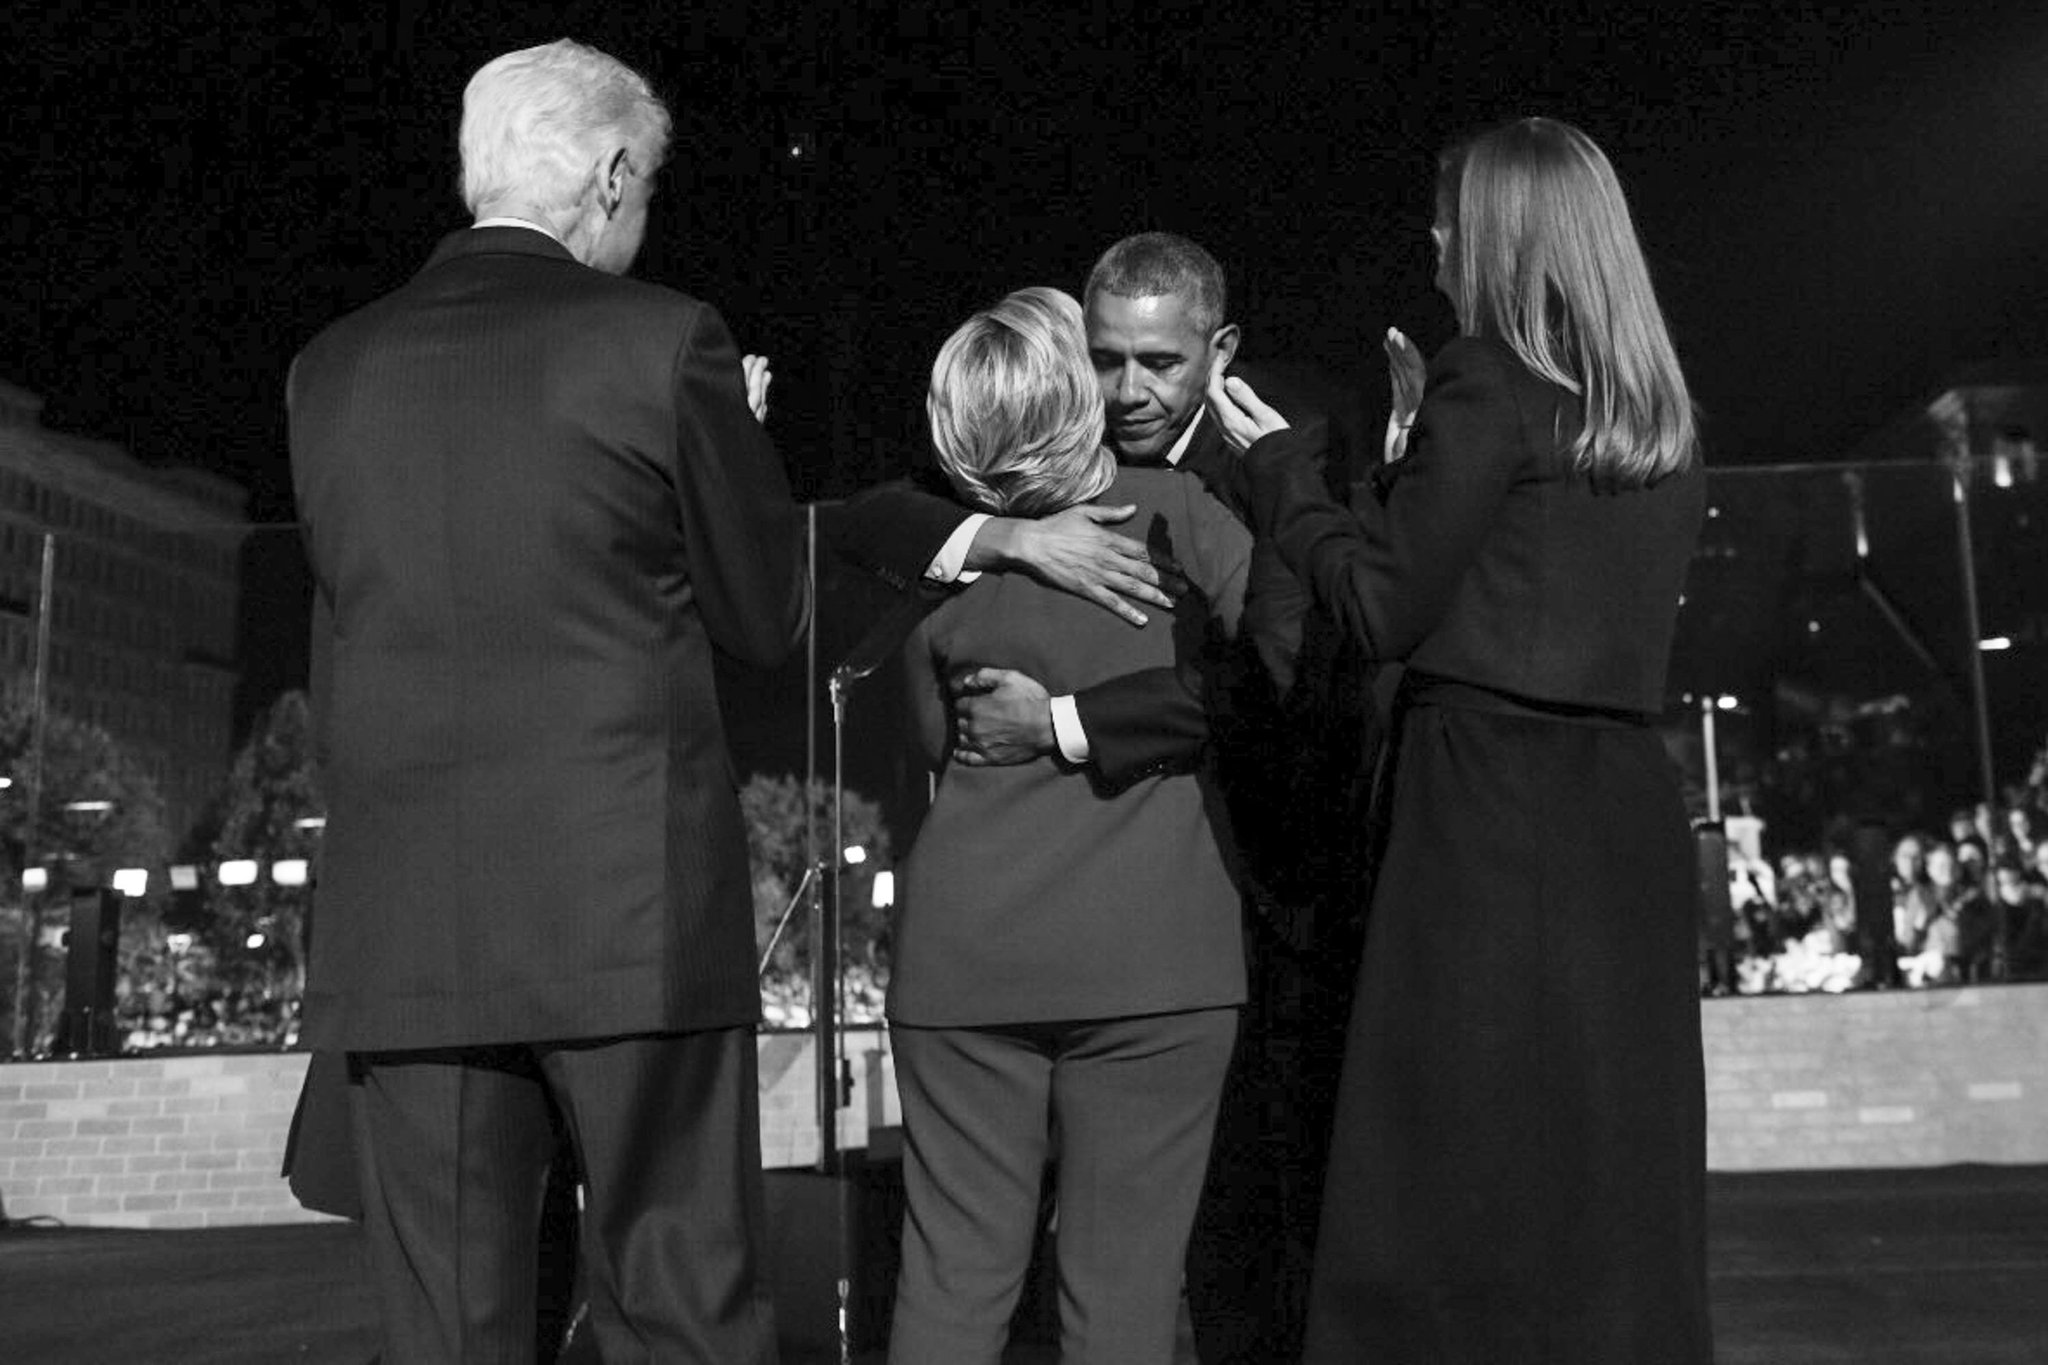 Stronger together. https://t.co/9TkaJrjW0a